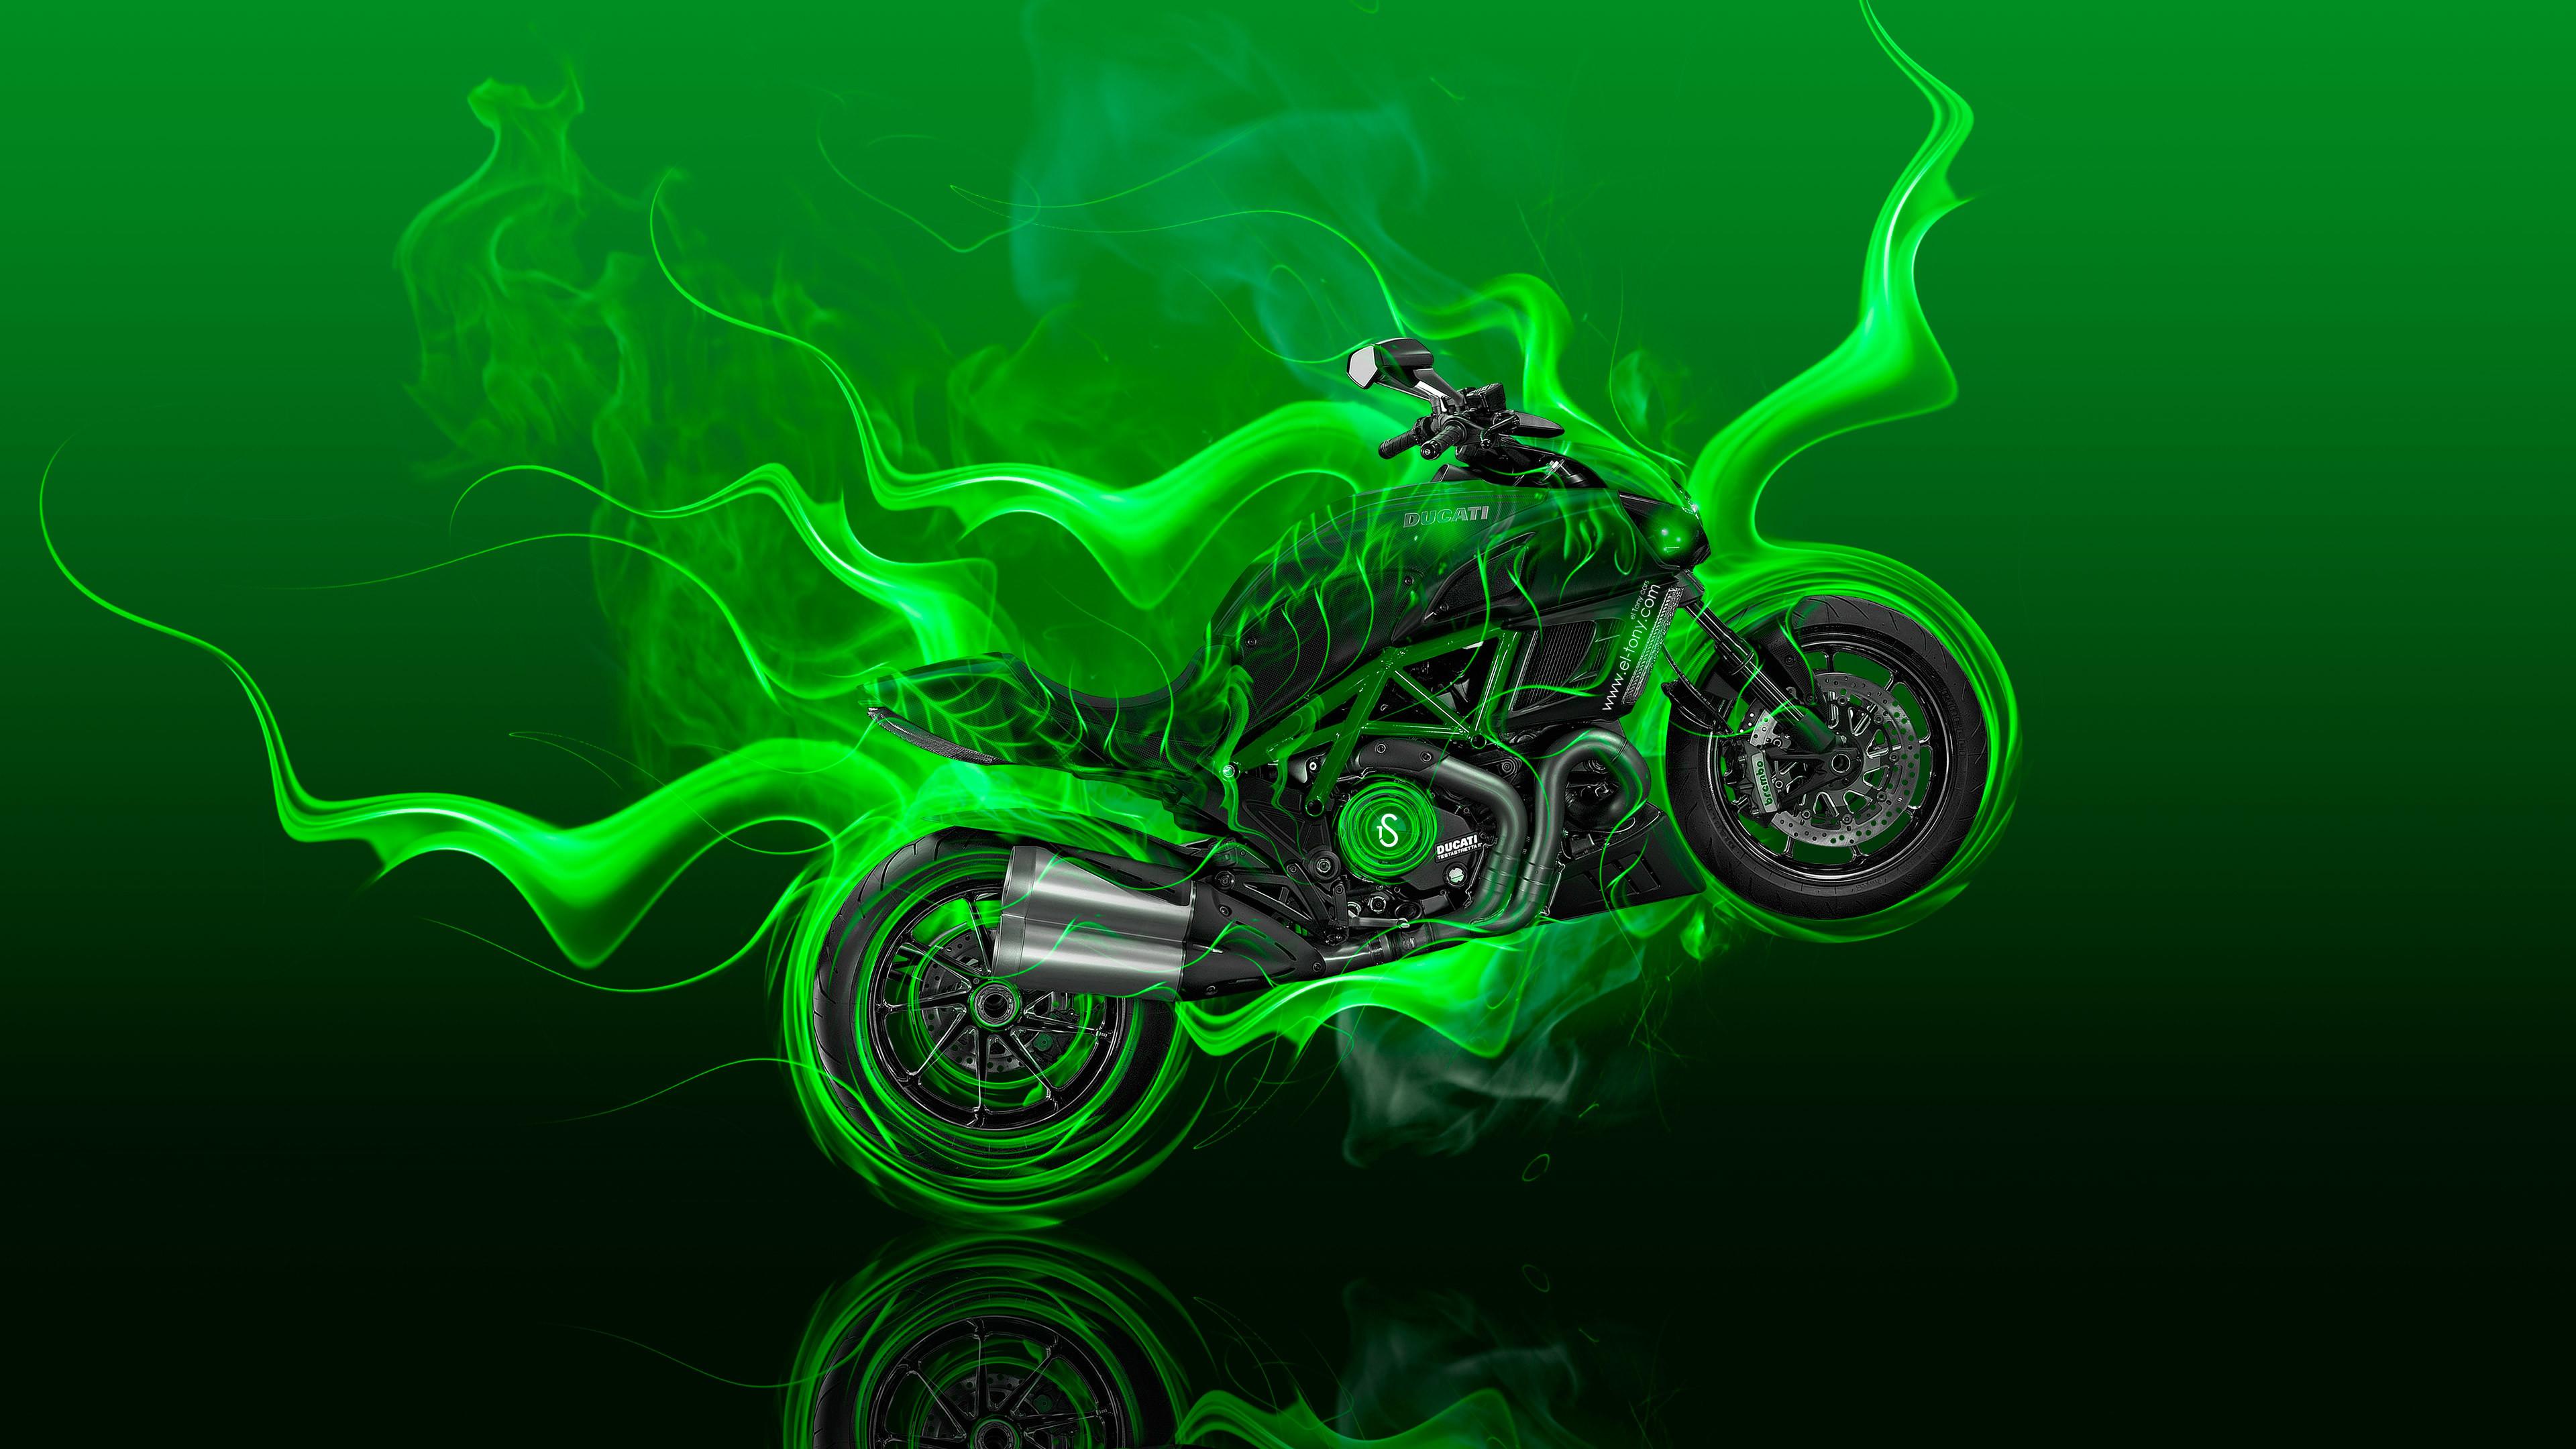 1799x2700 Download Bgreen Flame Skull B 240 X 320